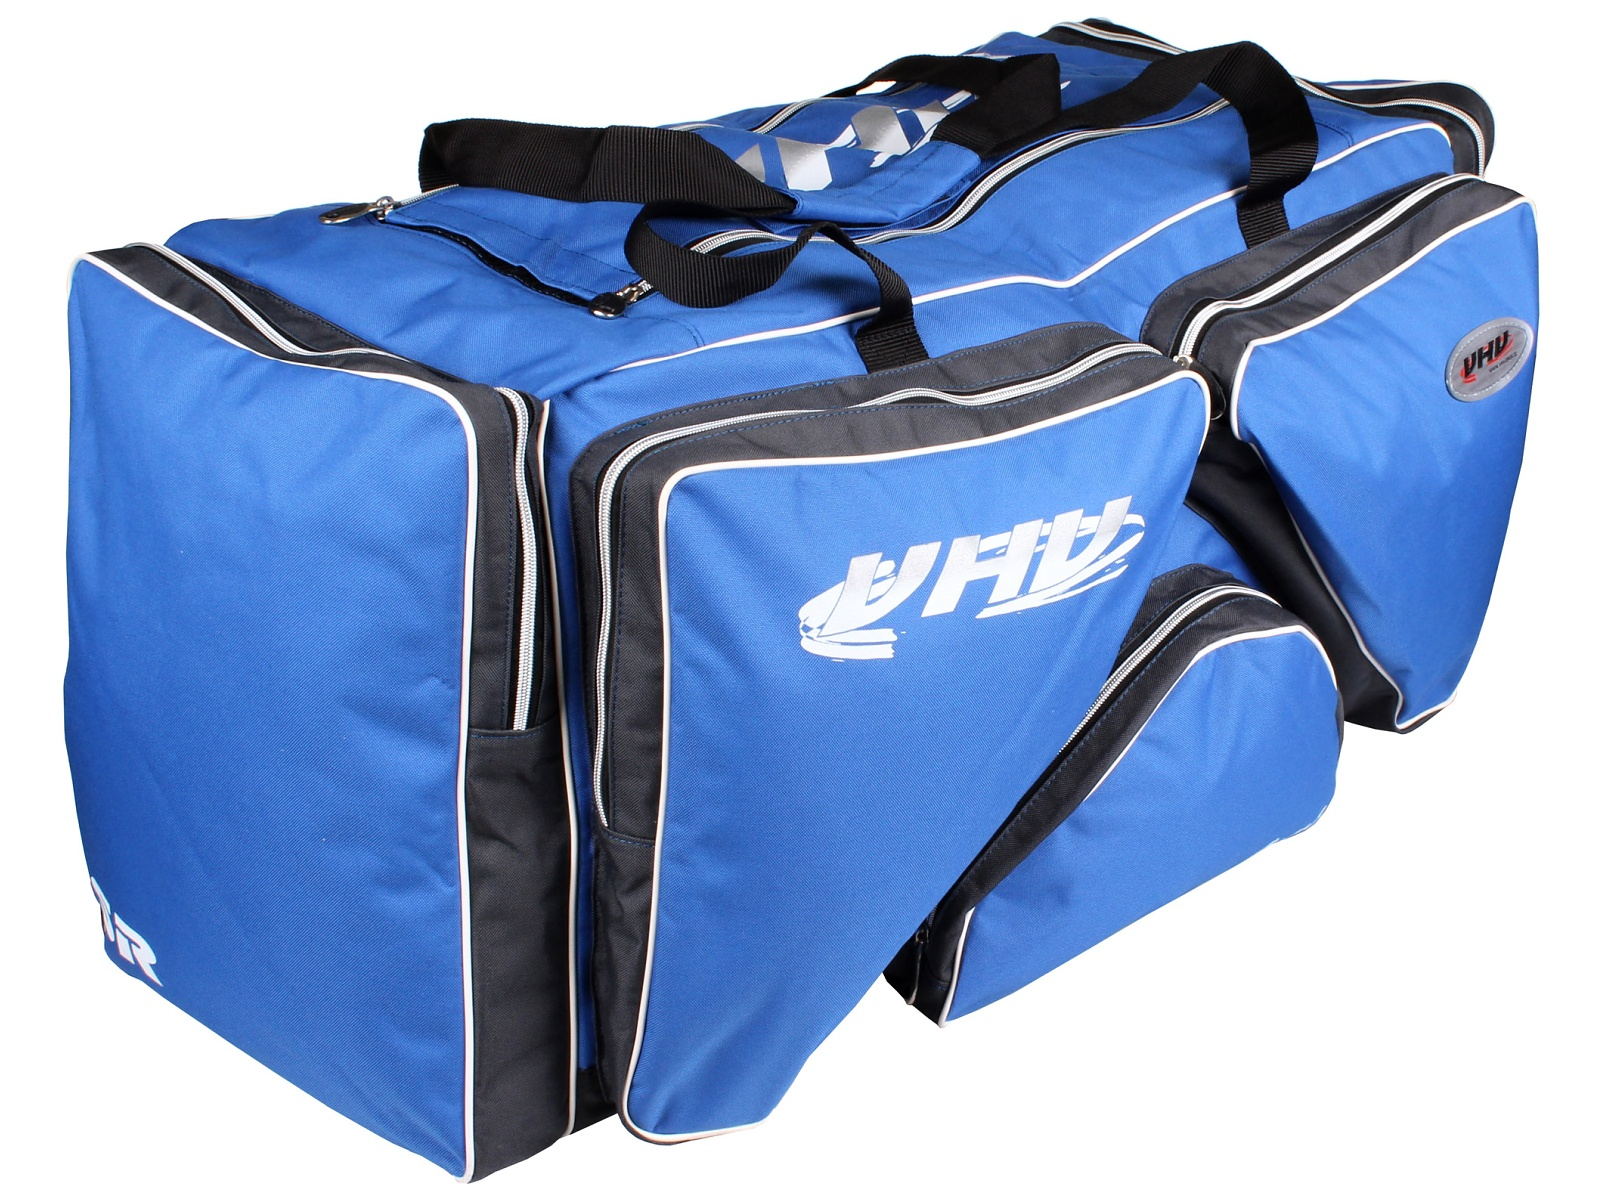 Hokejová taška OPUS 2231 modro-šedá